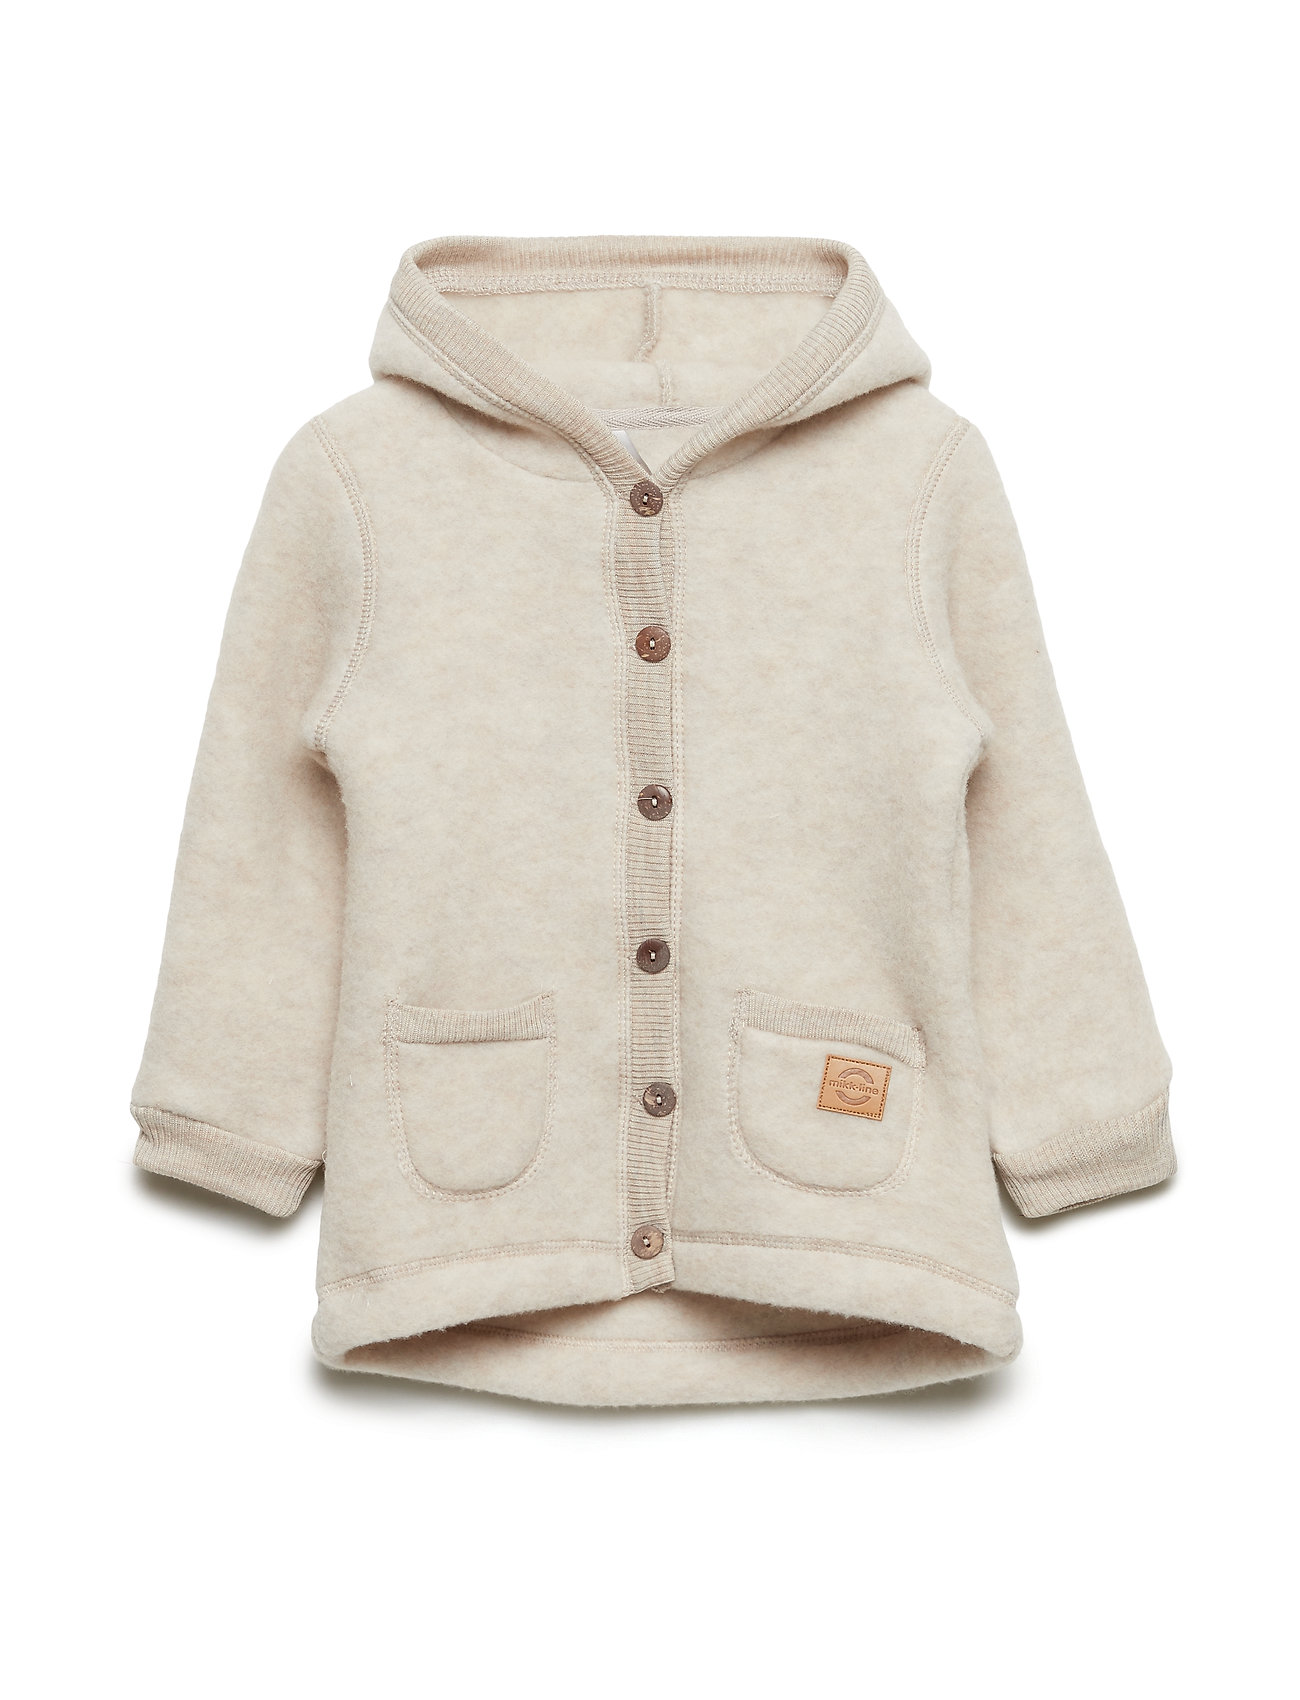 2de0e03f Wool Cardigan W/hood+pockets (Melange Offwhite) (499 kr) - Mikk-Line ...